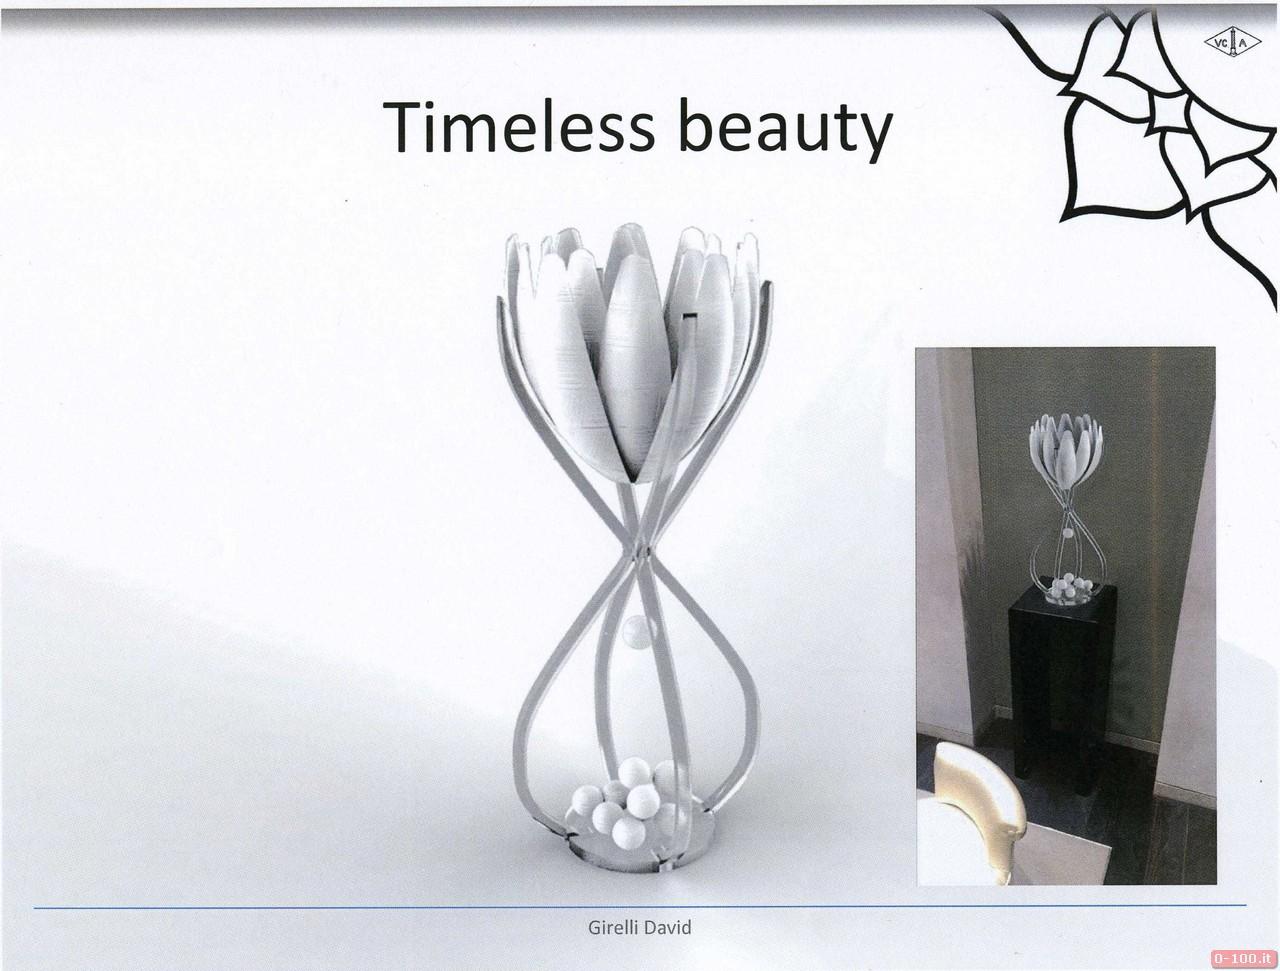 Blooming Creativity_Timeless Beauty - David Girelli _Van Cleef & Arpels_0-100 2